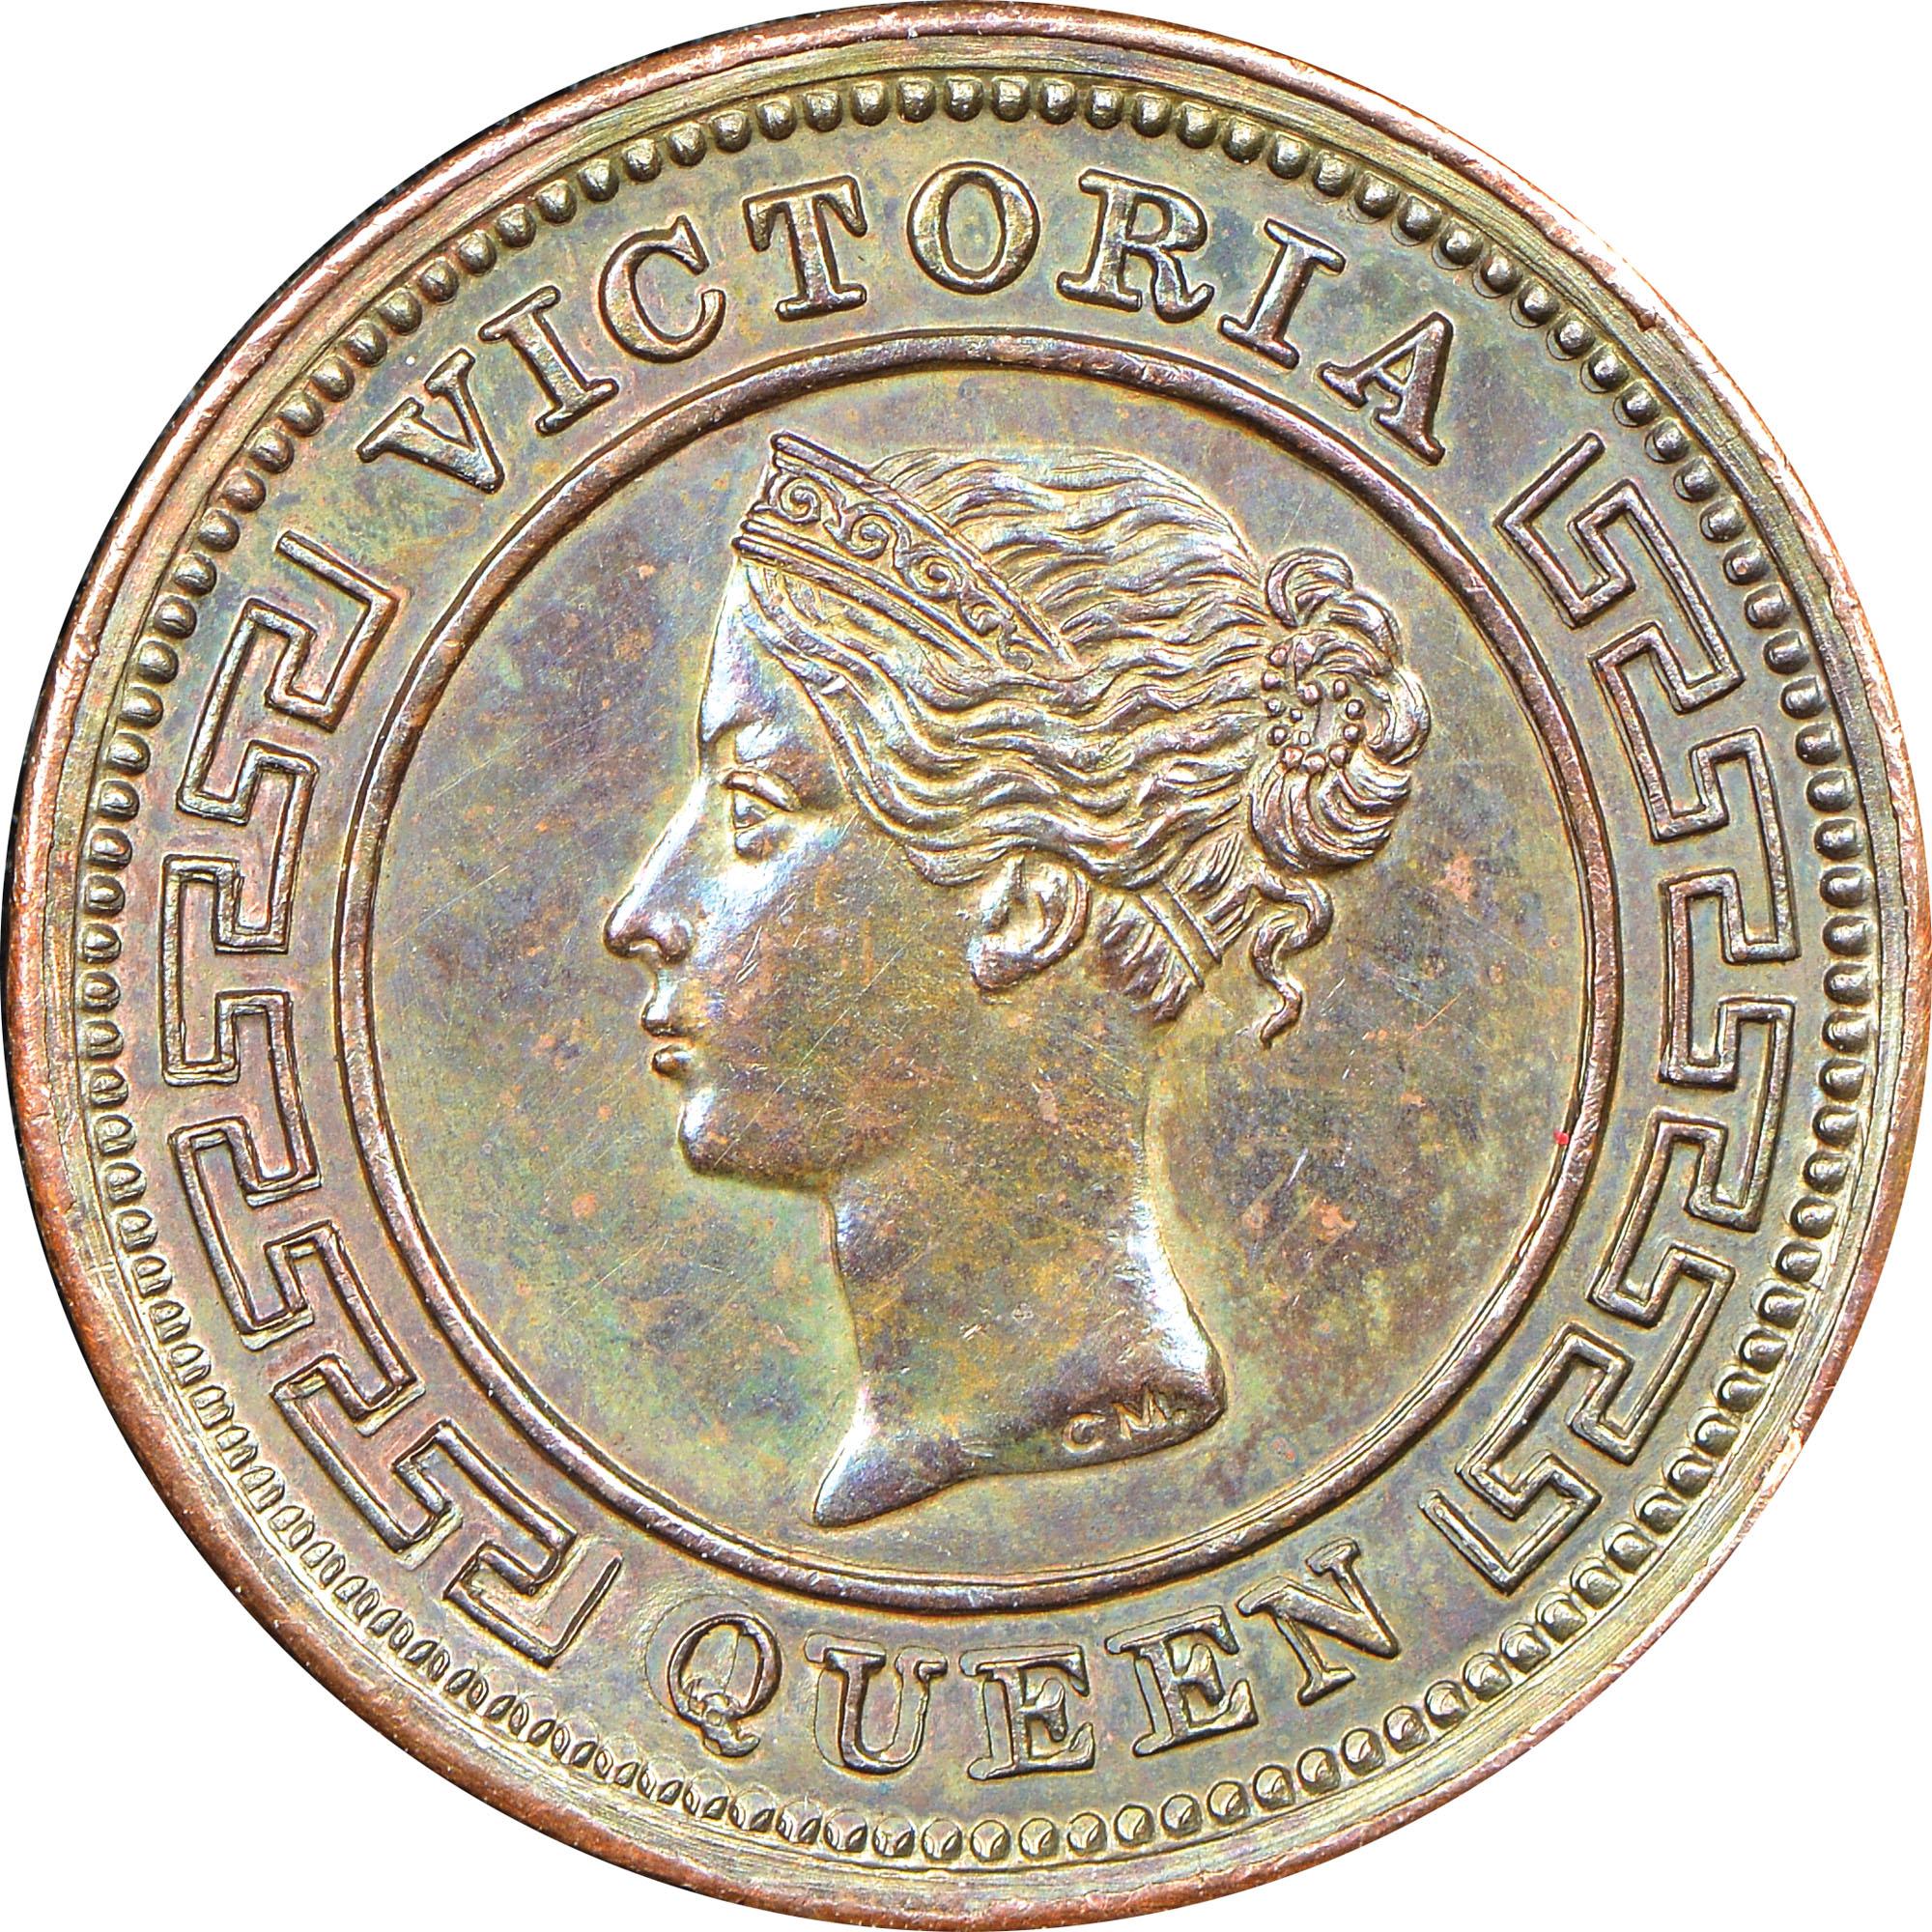 Ceylon 1/4 Cent obverse